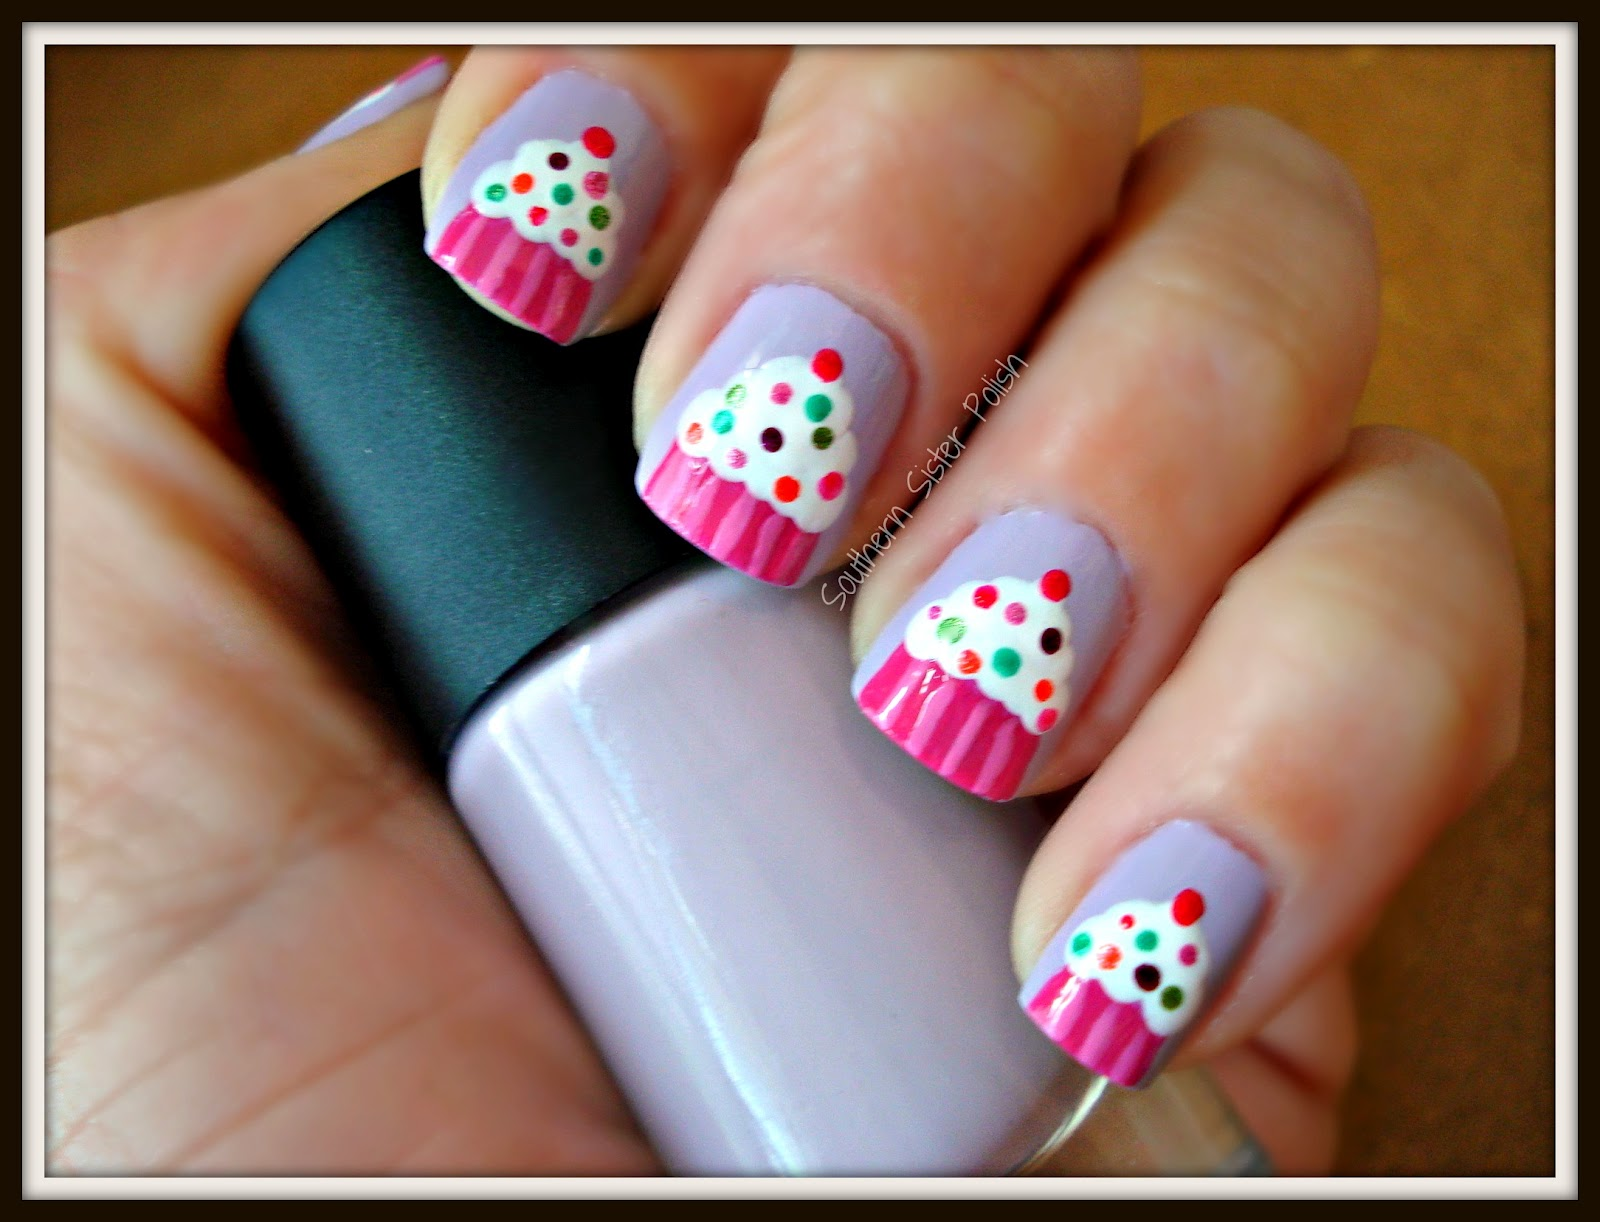 Southern sister polish nail art wednesday birthday cupcakes nail art wednesday birthday cupcakes prinsesfo Gallery